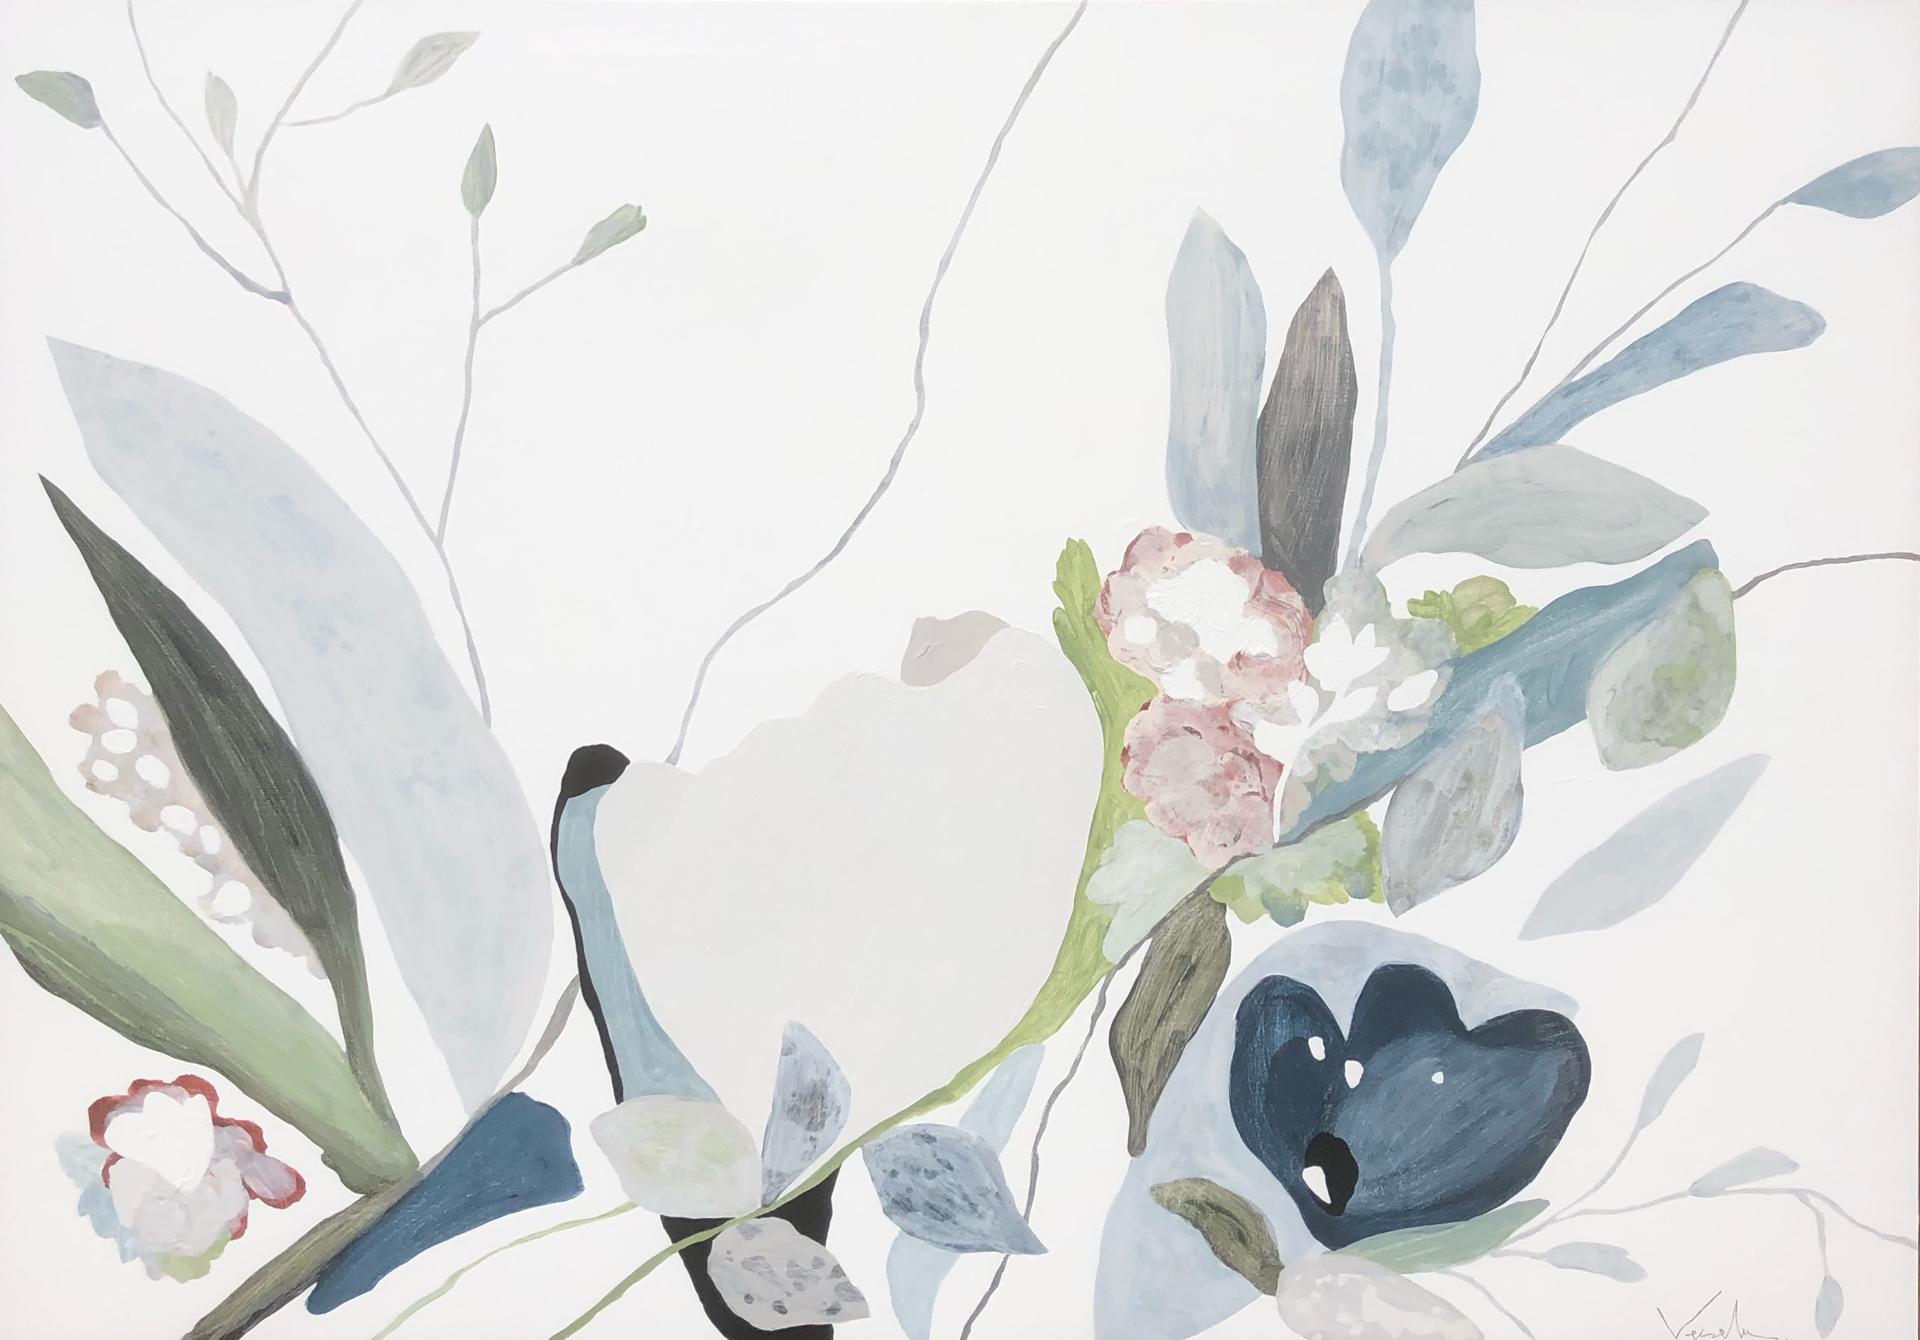 Hope and Dream by Vesela Baker